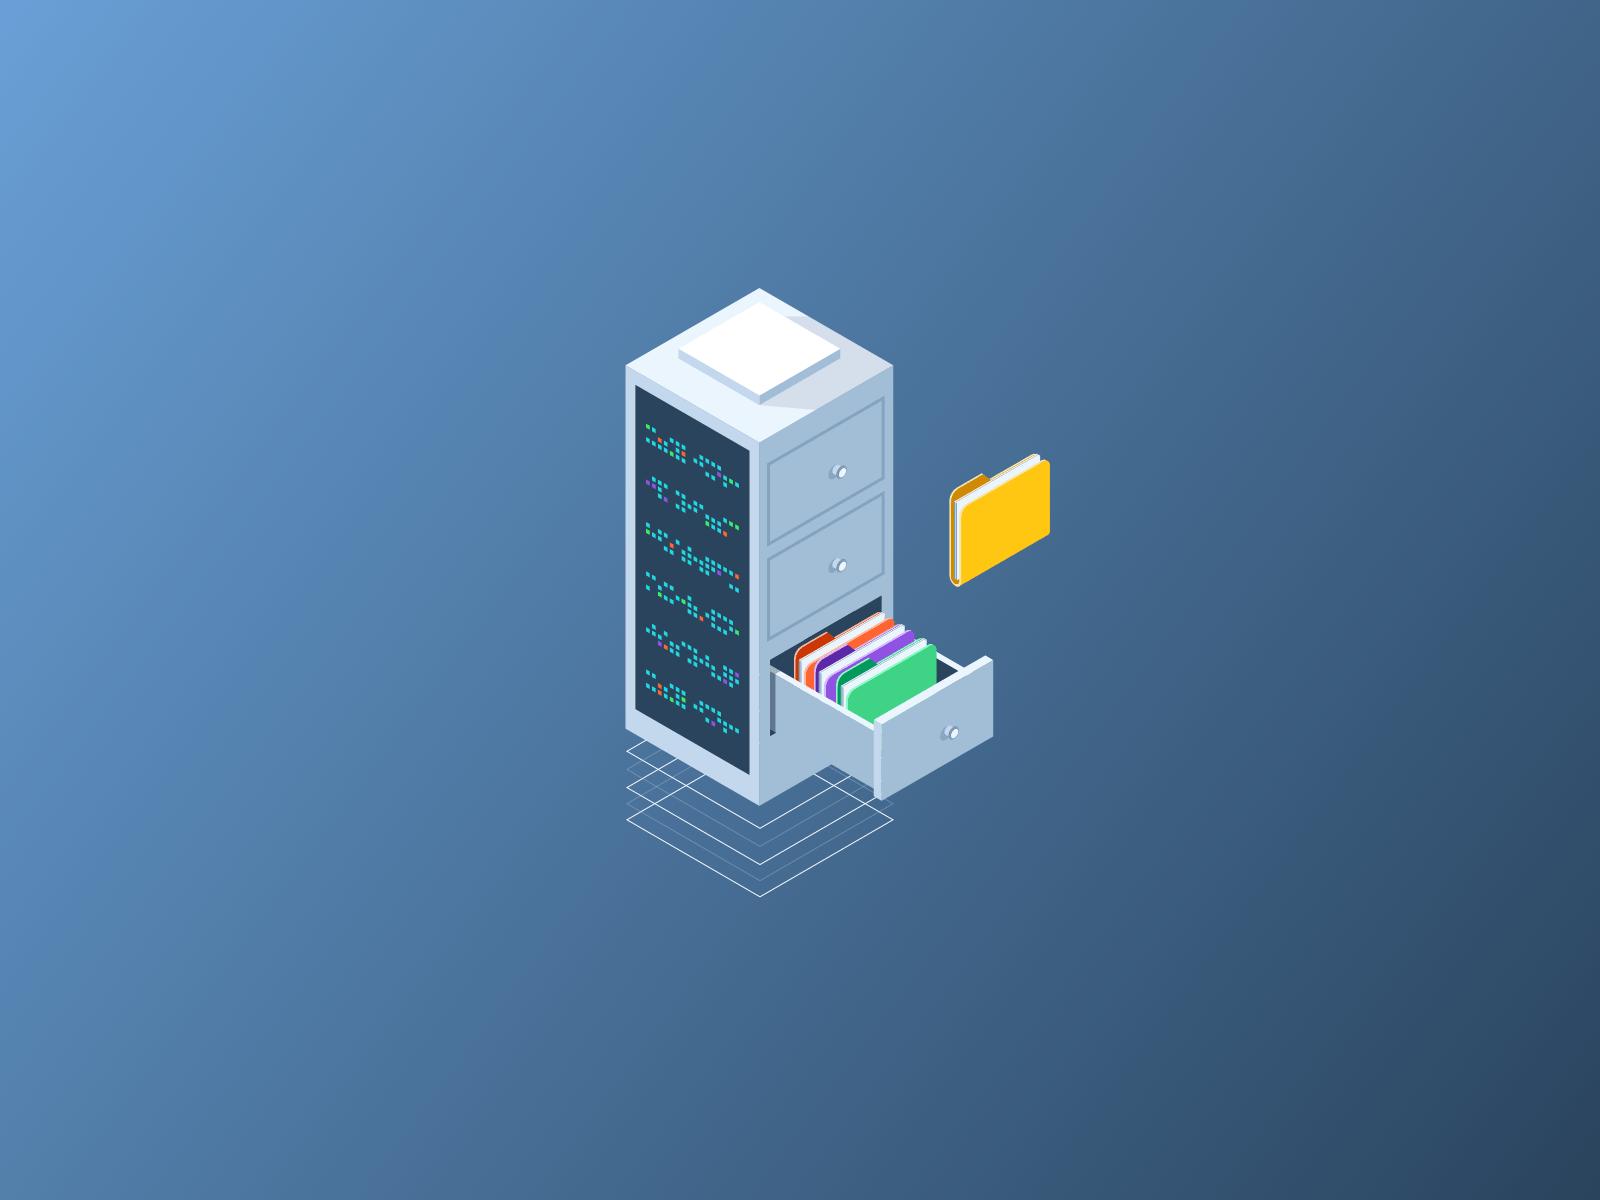 _IoT---Relational-Database